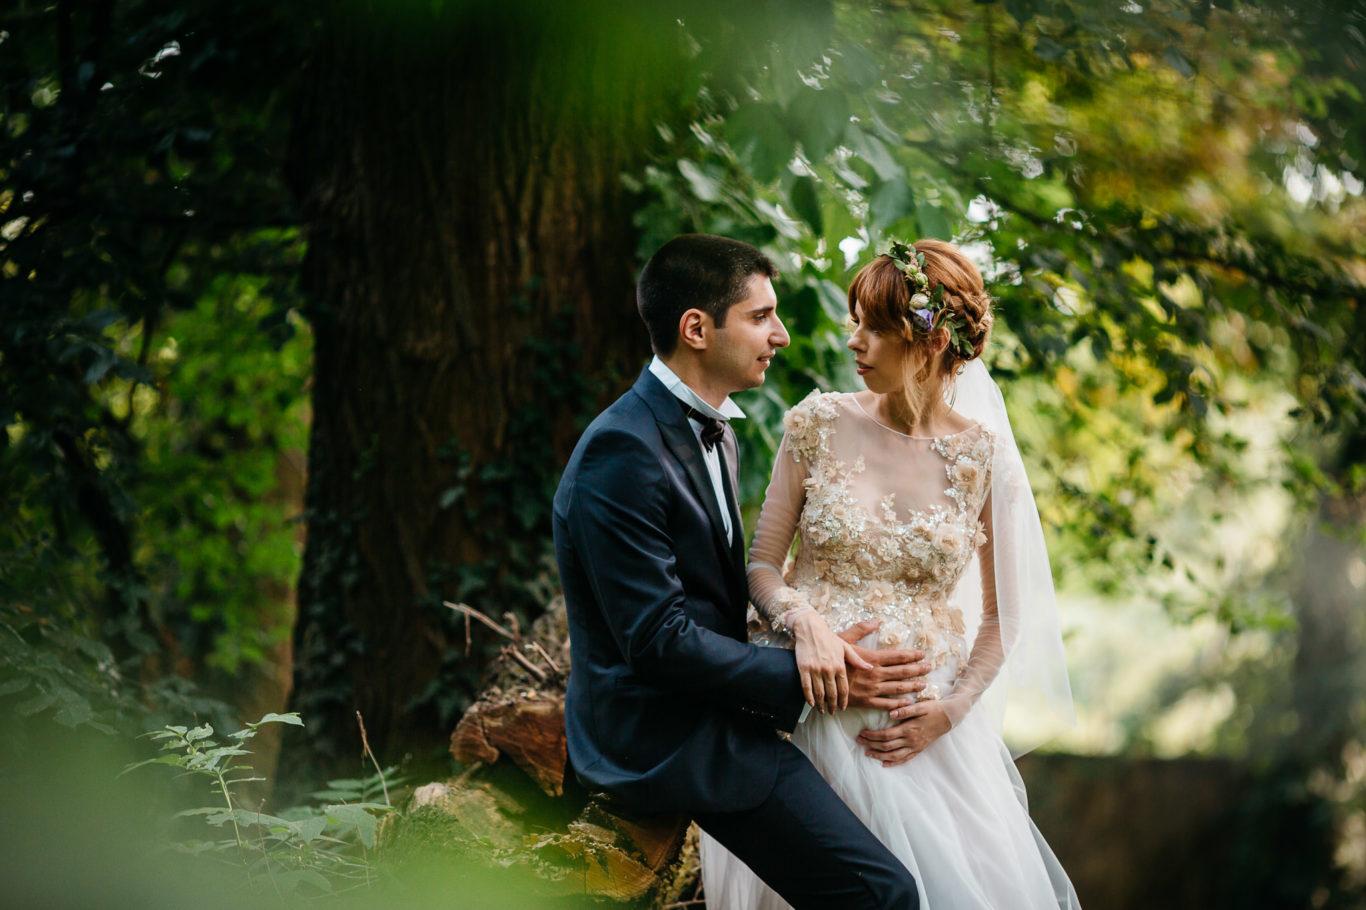 0206-Fotografie-nunta-Stirbey-Laura-Rares-fotograf-Ciprian-Dumitrescu-DCF_3449